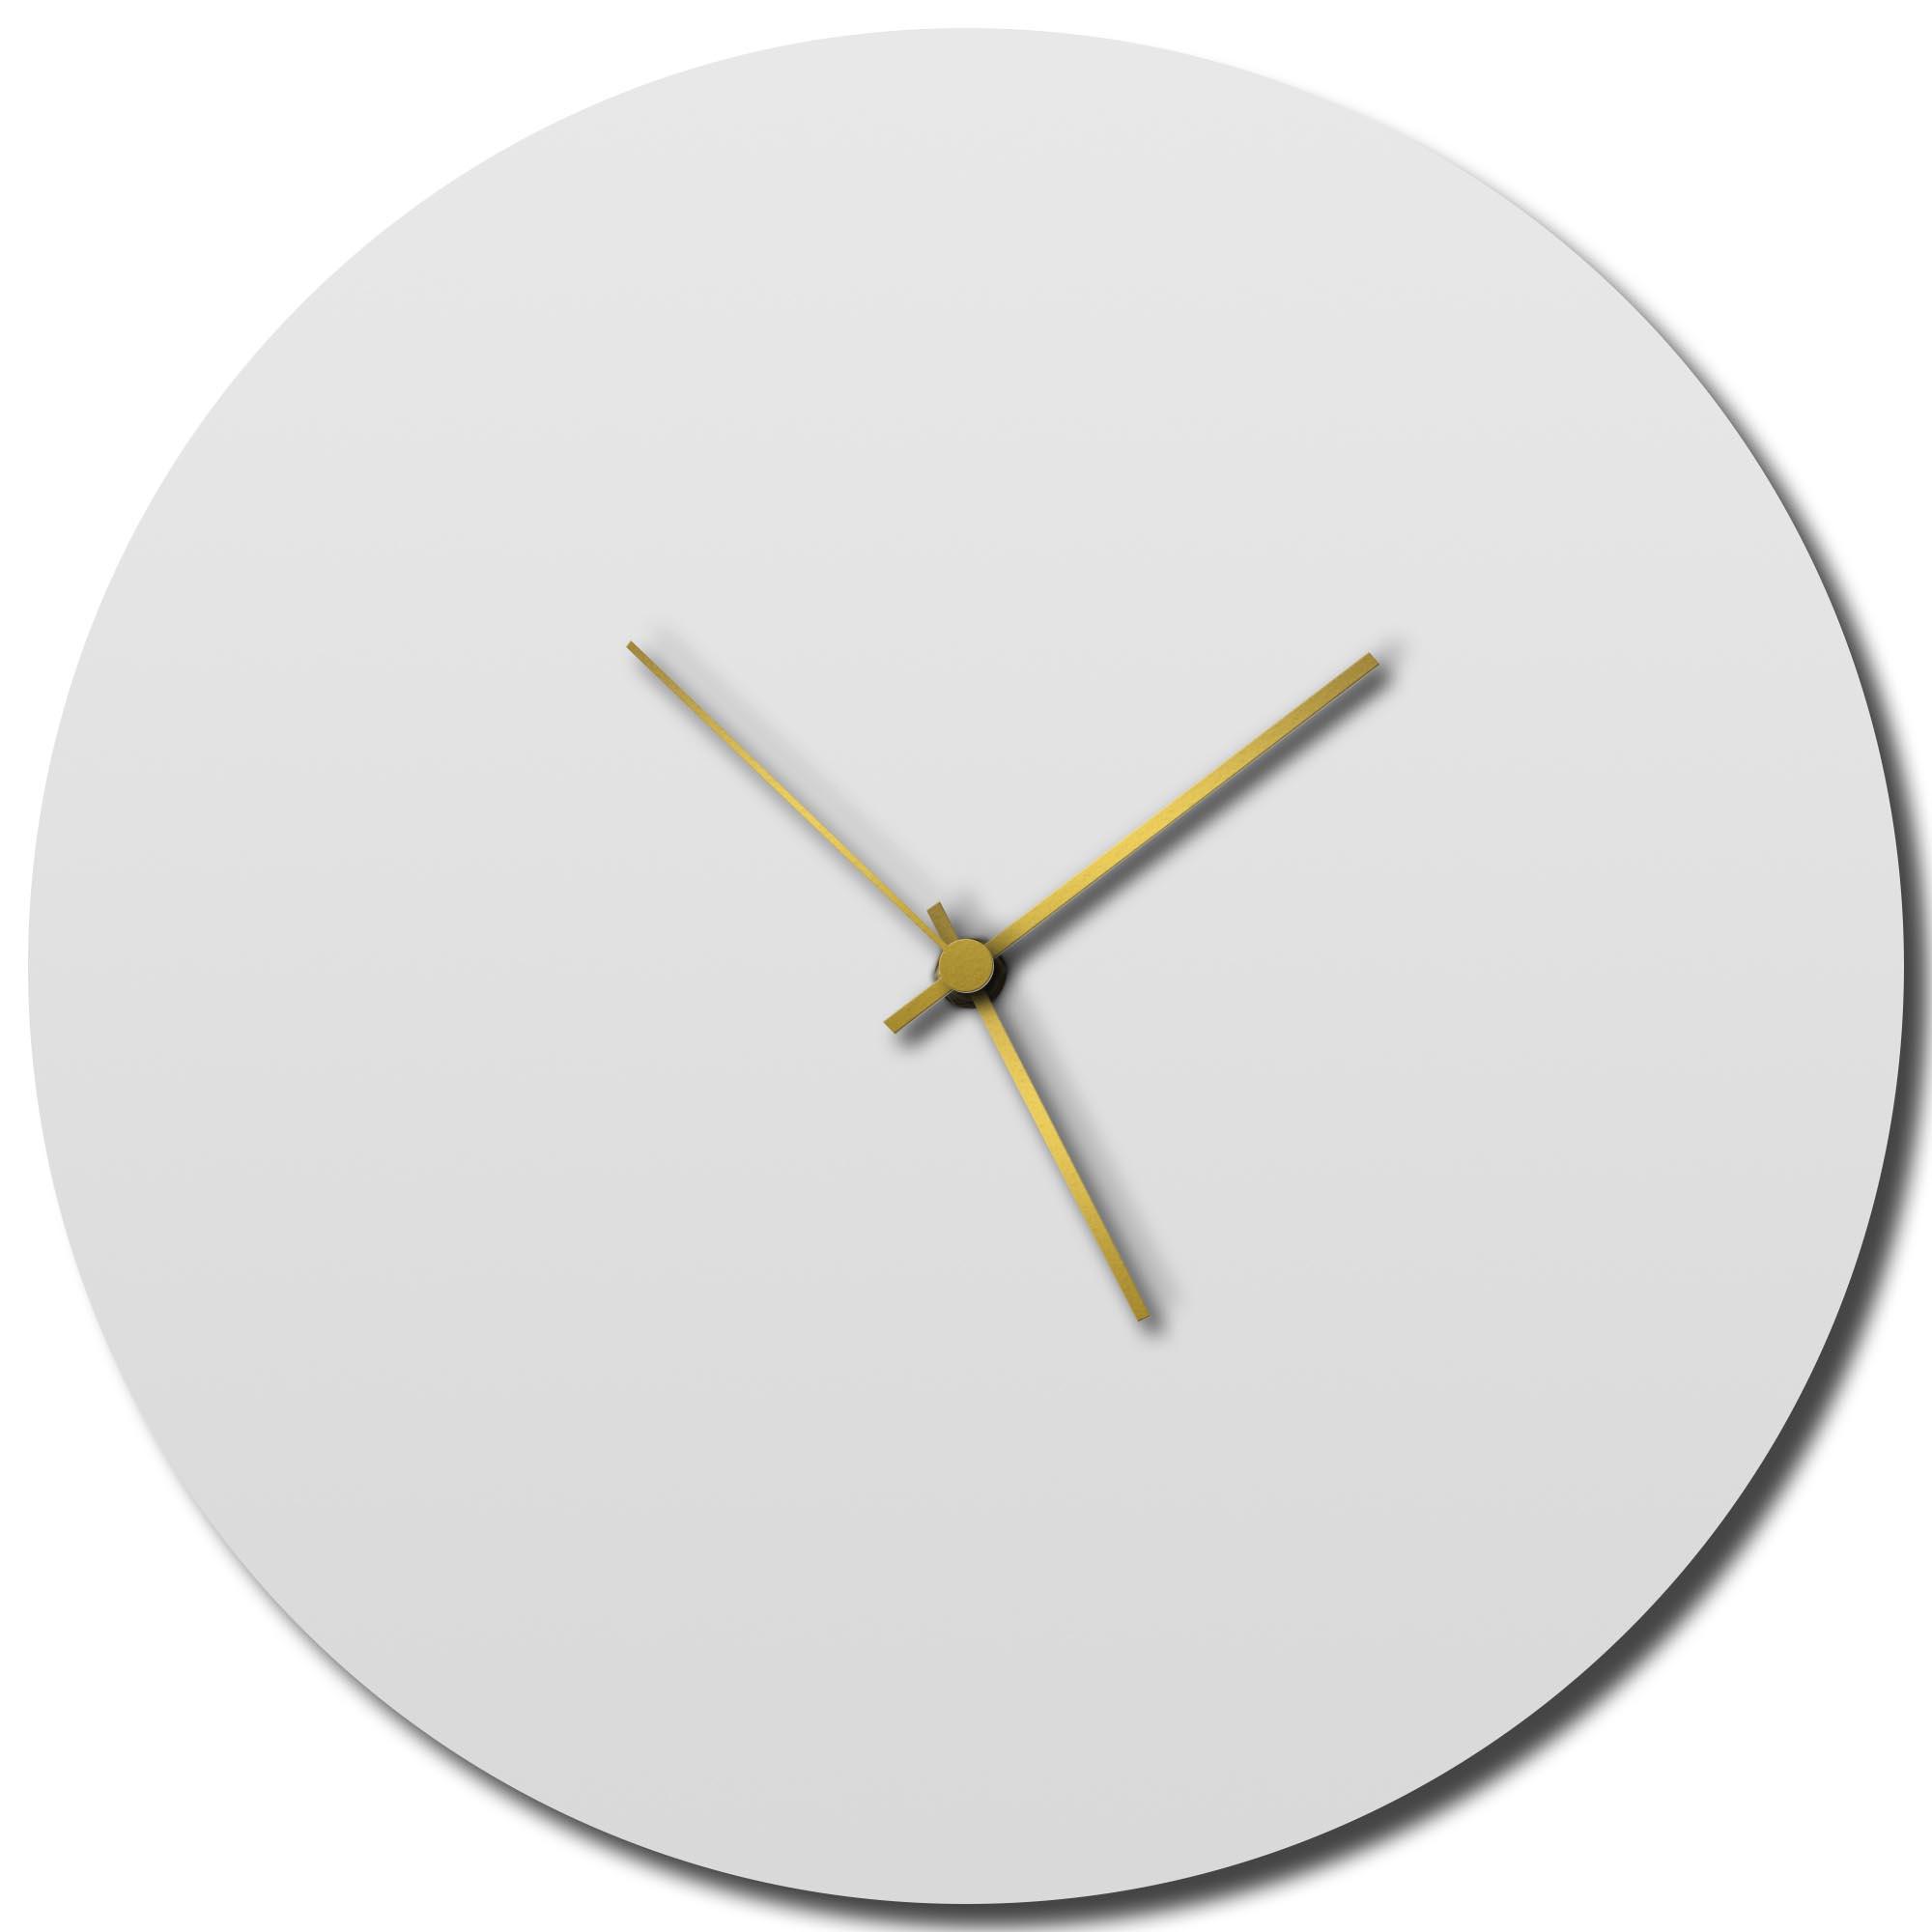 Adam Schwoeppe 'Whiteout Gold Circle Clock Large' Midcentury Modern Style Wall Clock